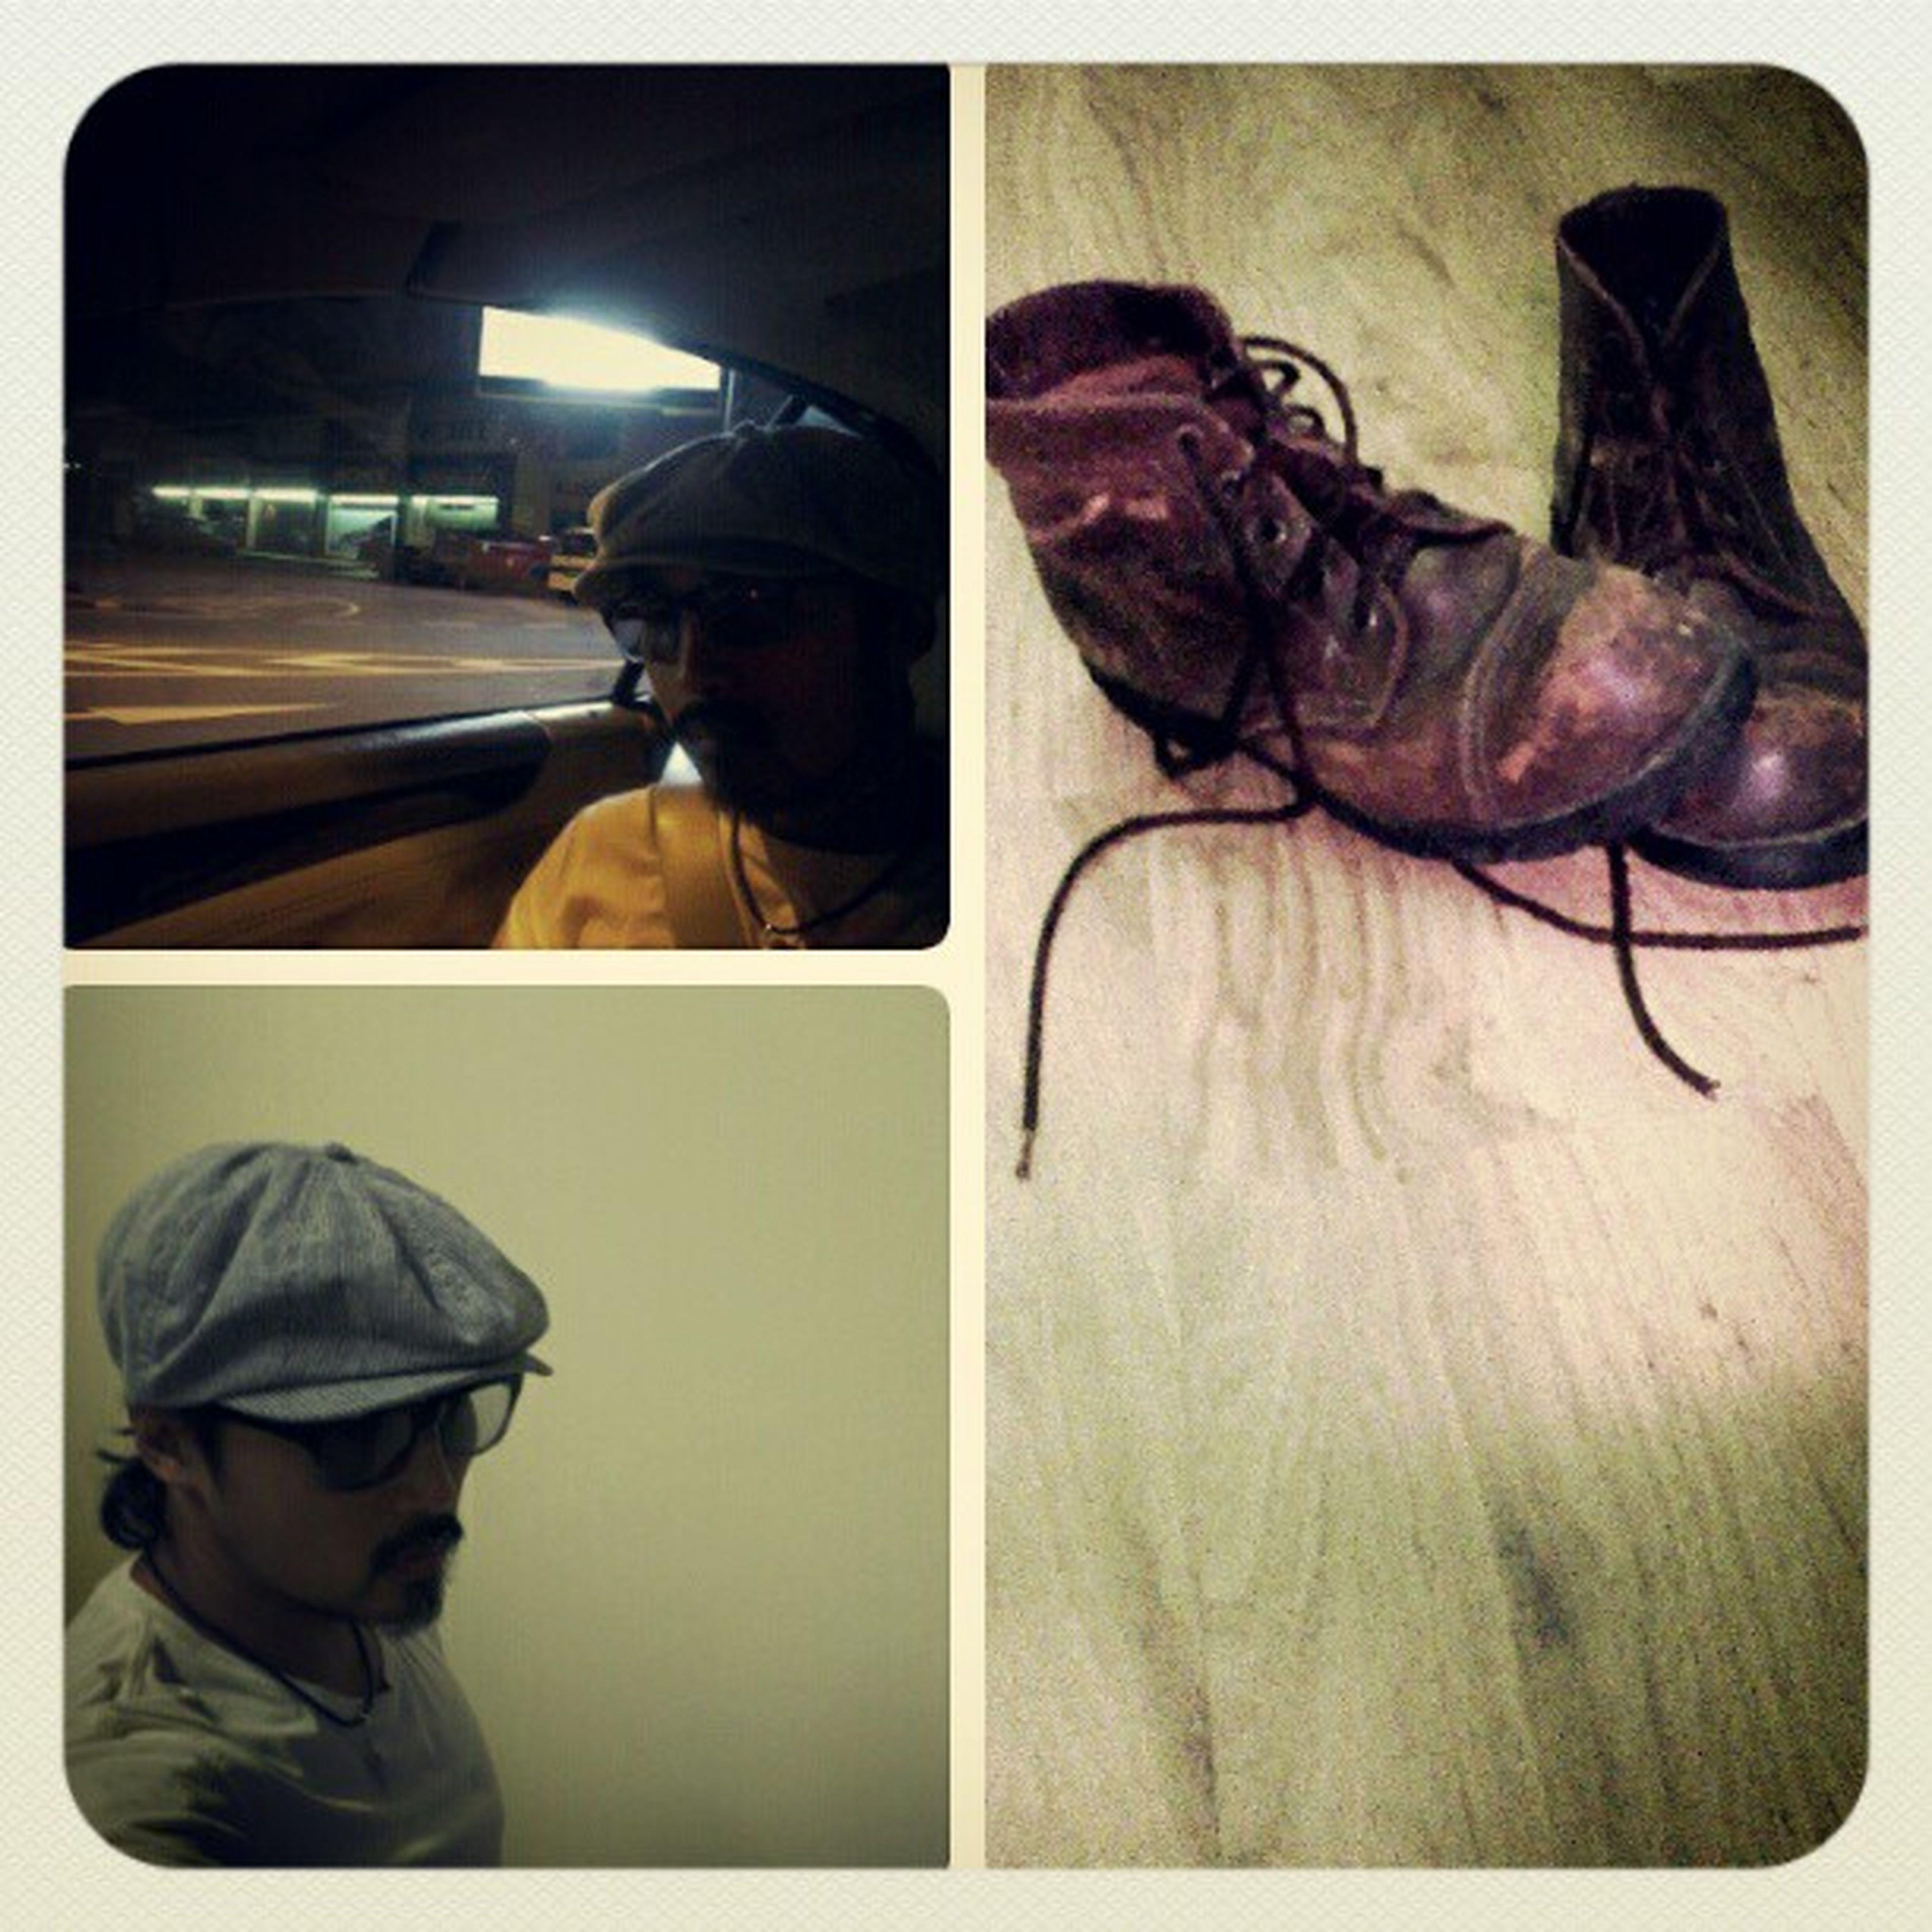 We went, we drove, we came back. Nightsdone Whatmore ? Thomassabo Undergroundboots nightout home B4midnight